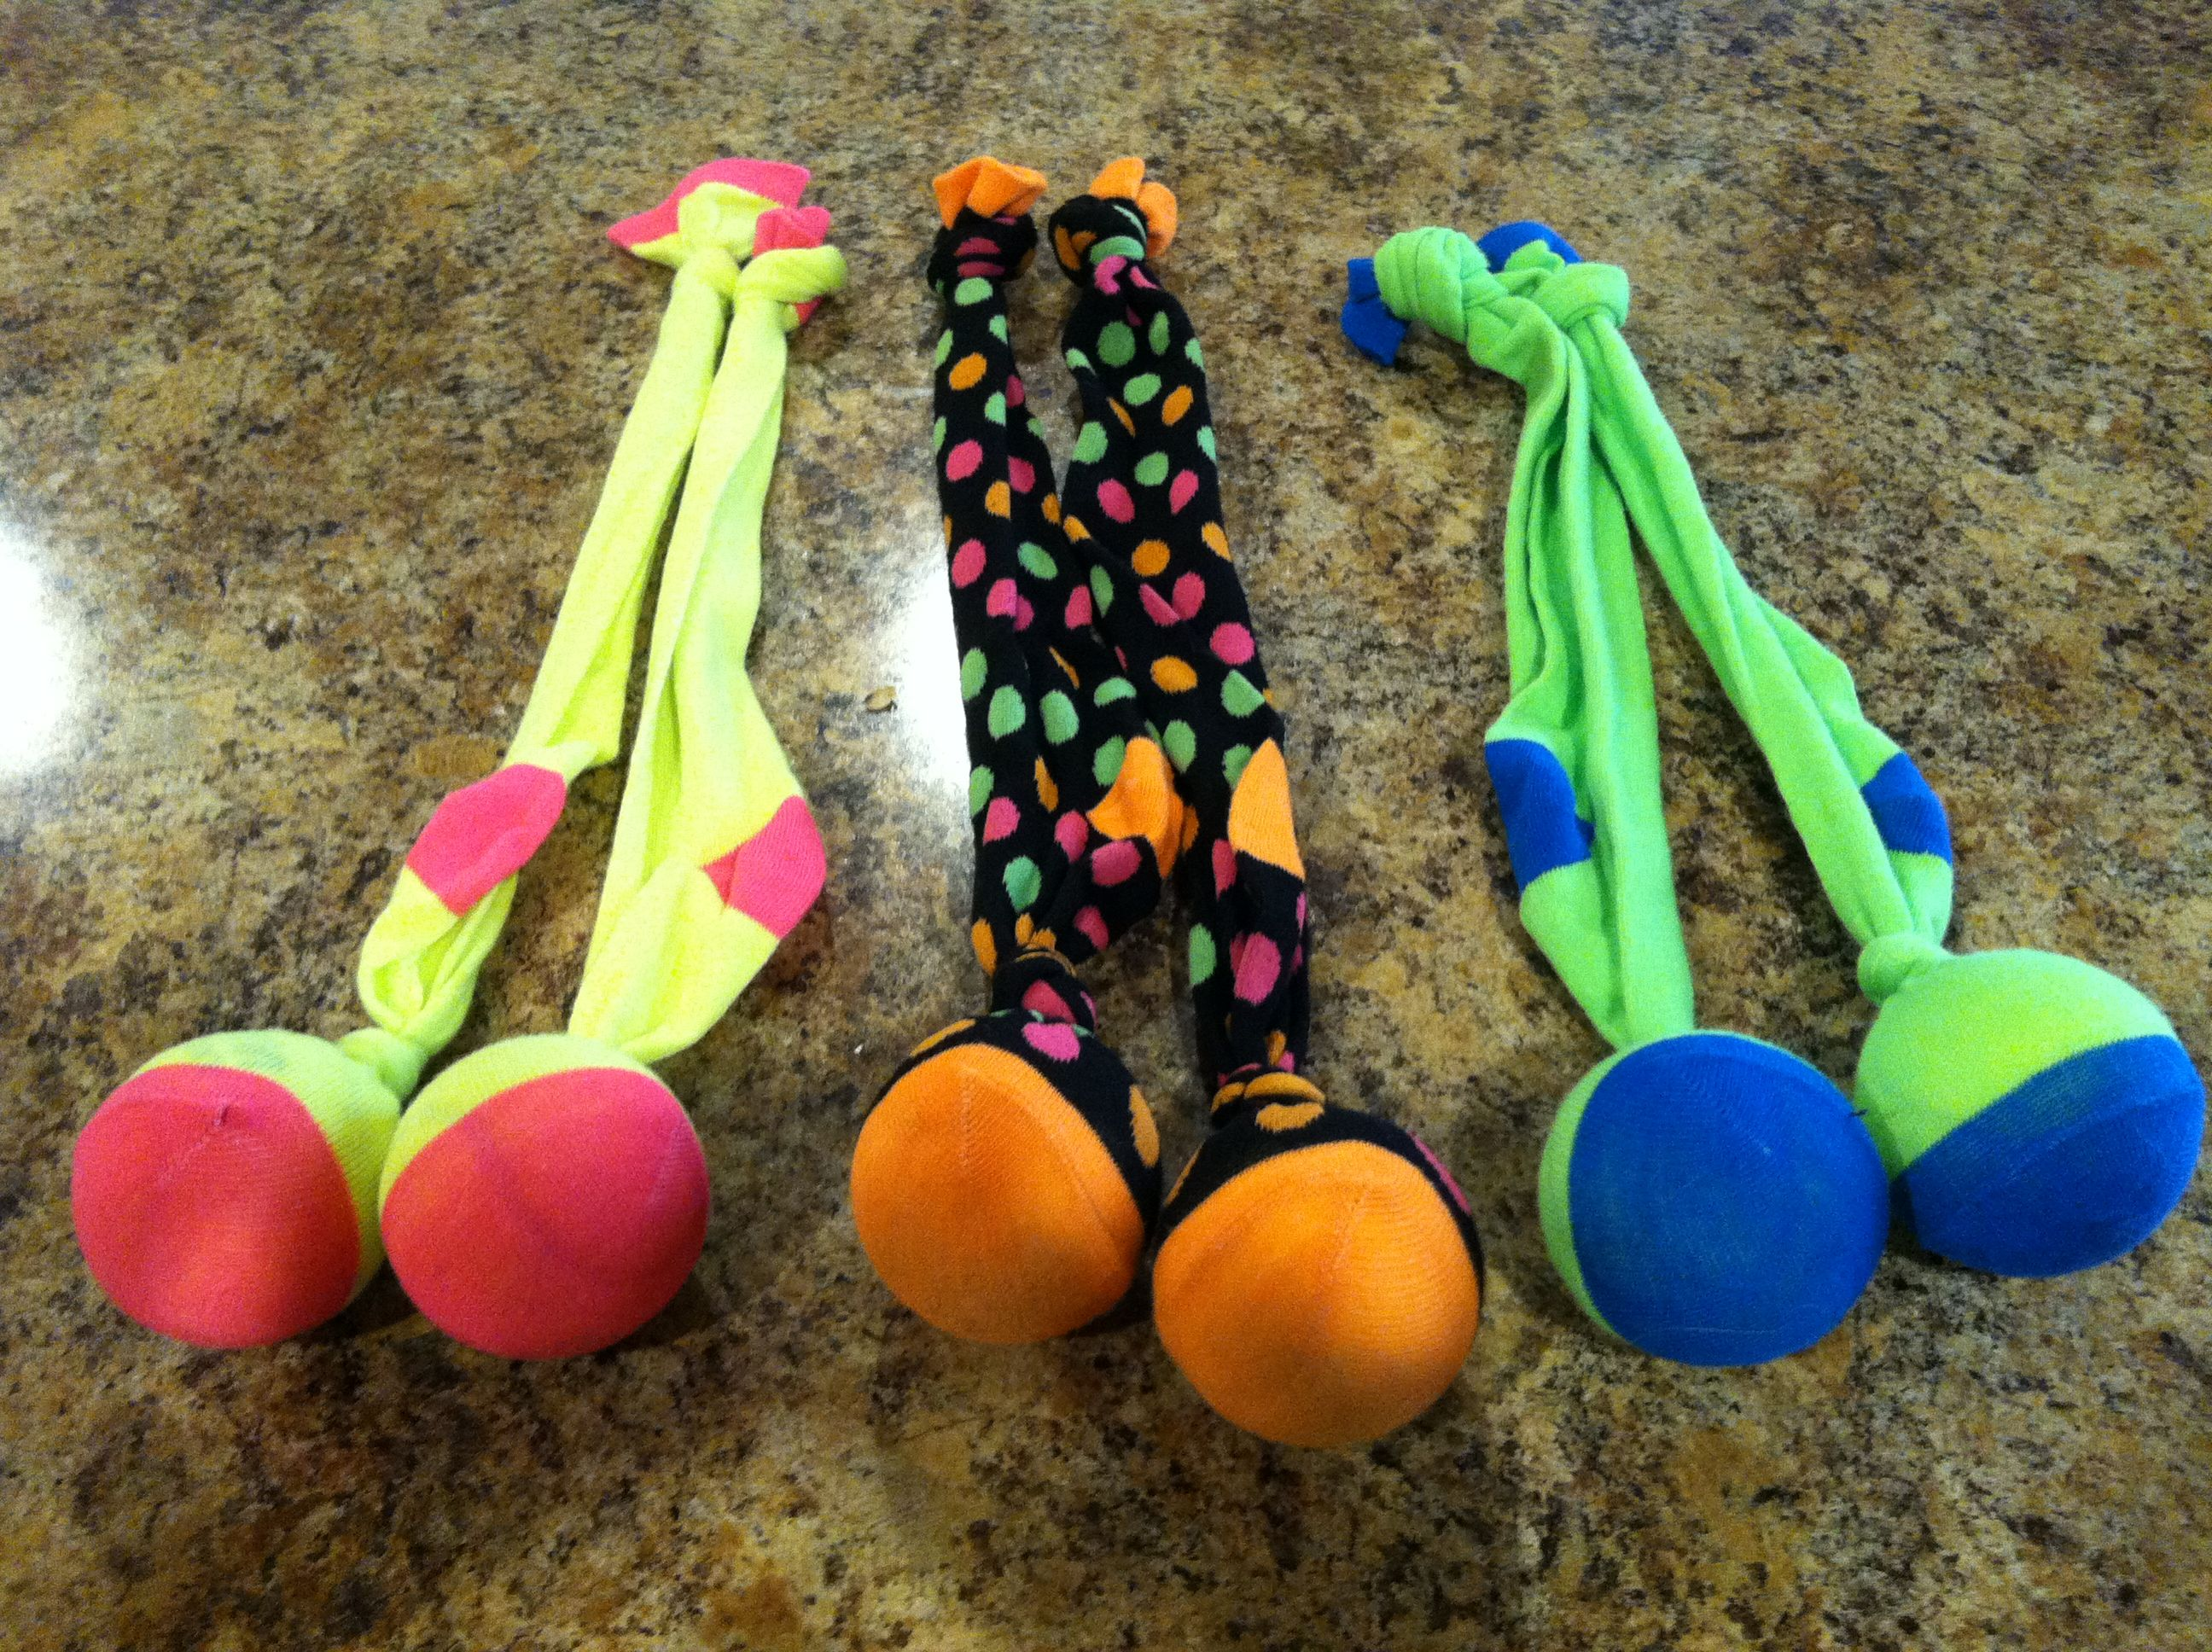 39+ Two tennis balls in a sock ideas